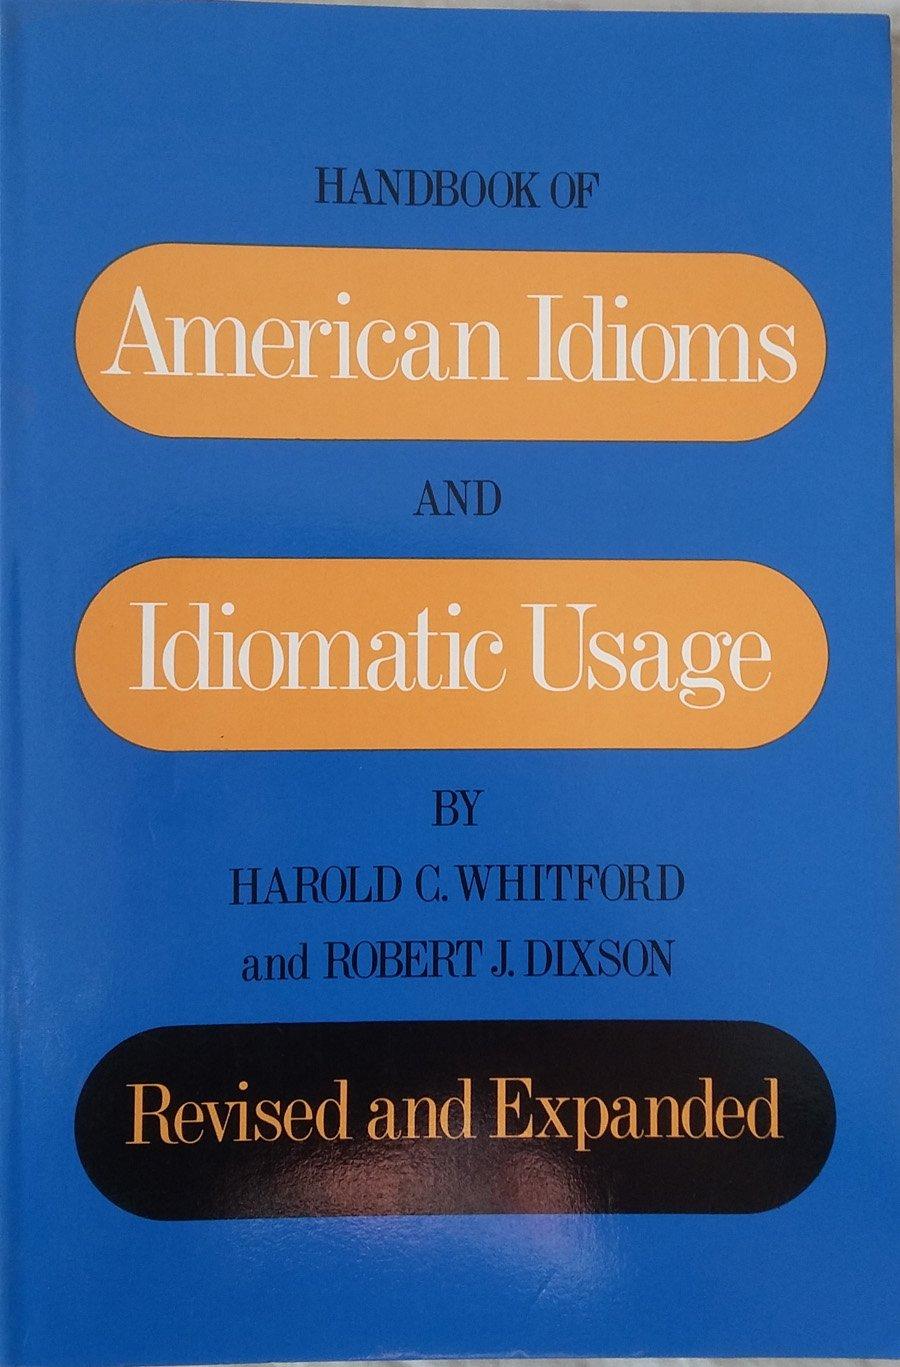 Handbook of American Idioms and Idiomatic Usage: Harold Crandall Whitford:  9780133725667: Books - Amazon.ca